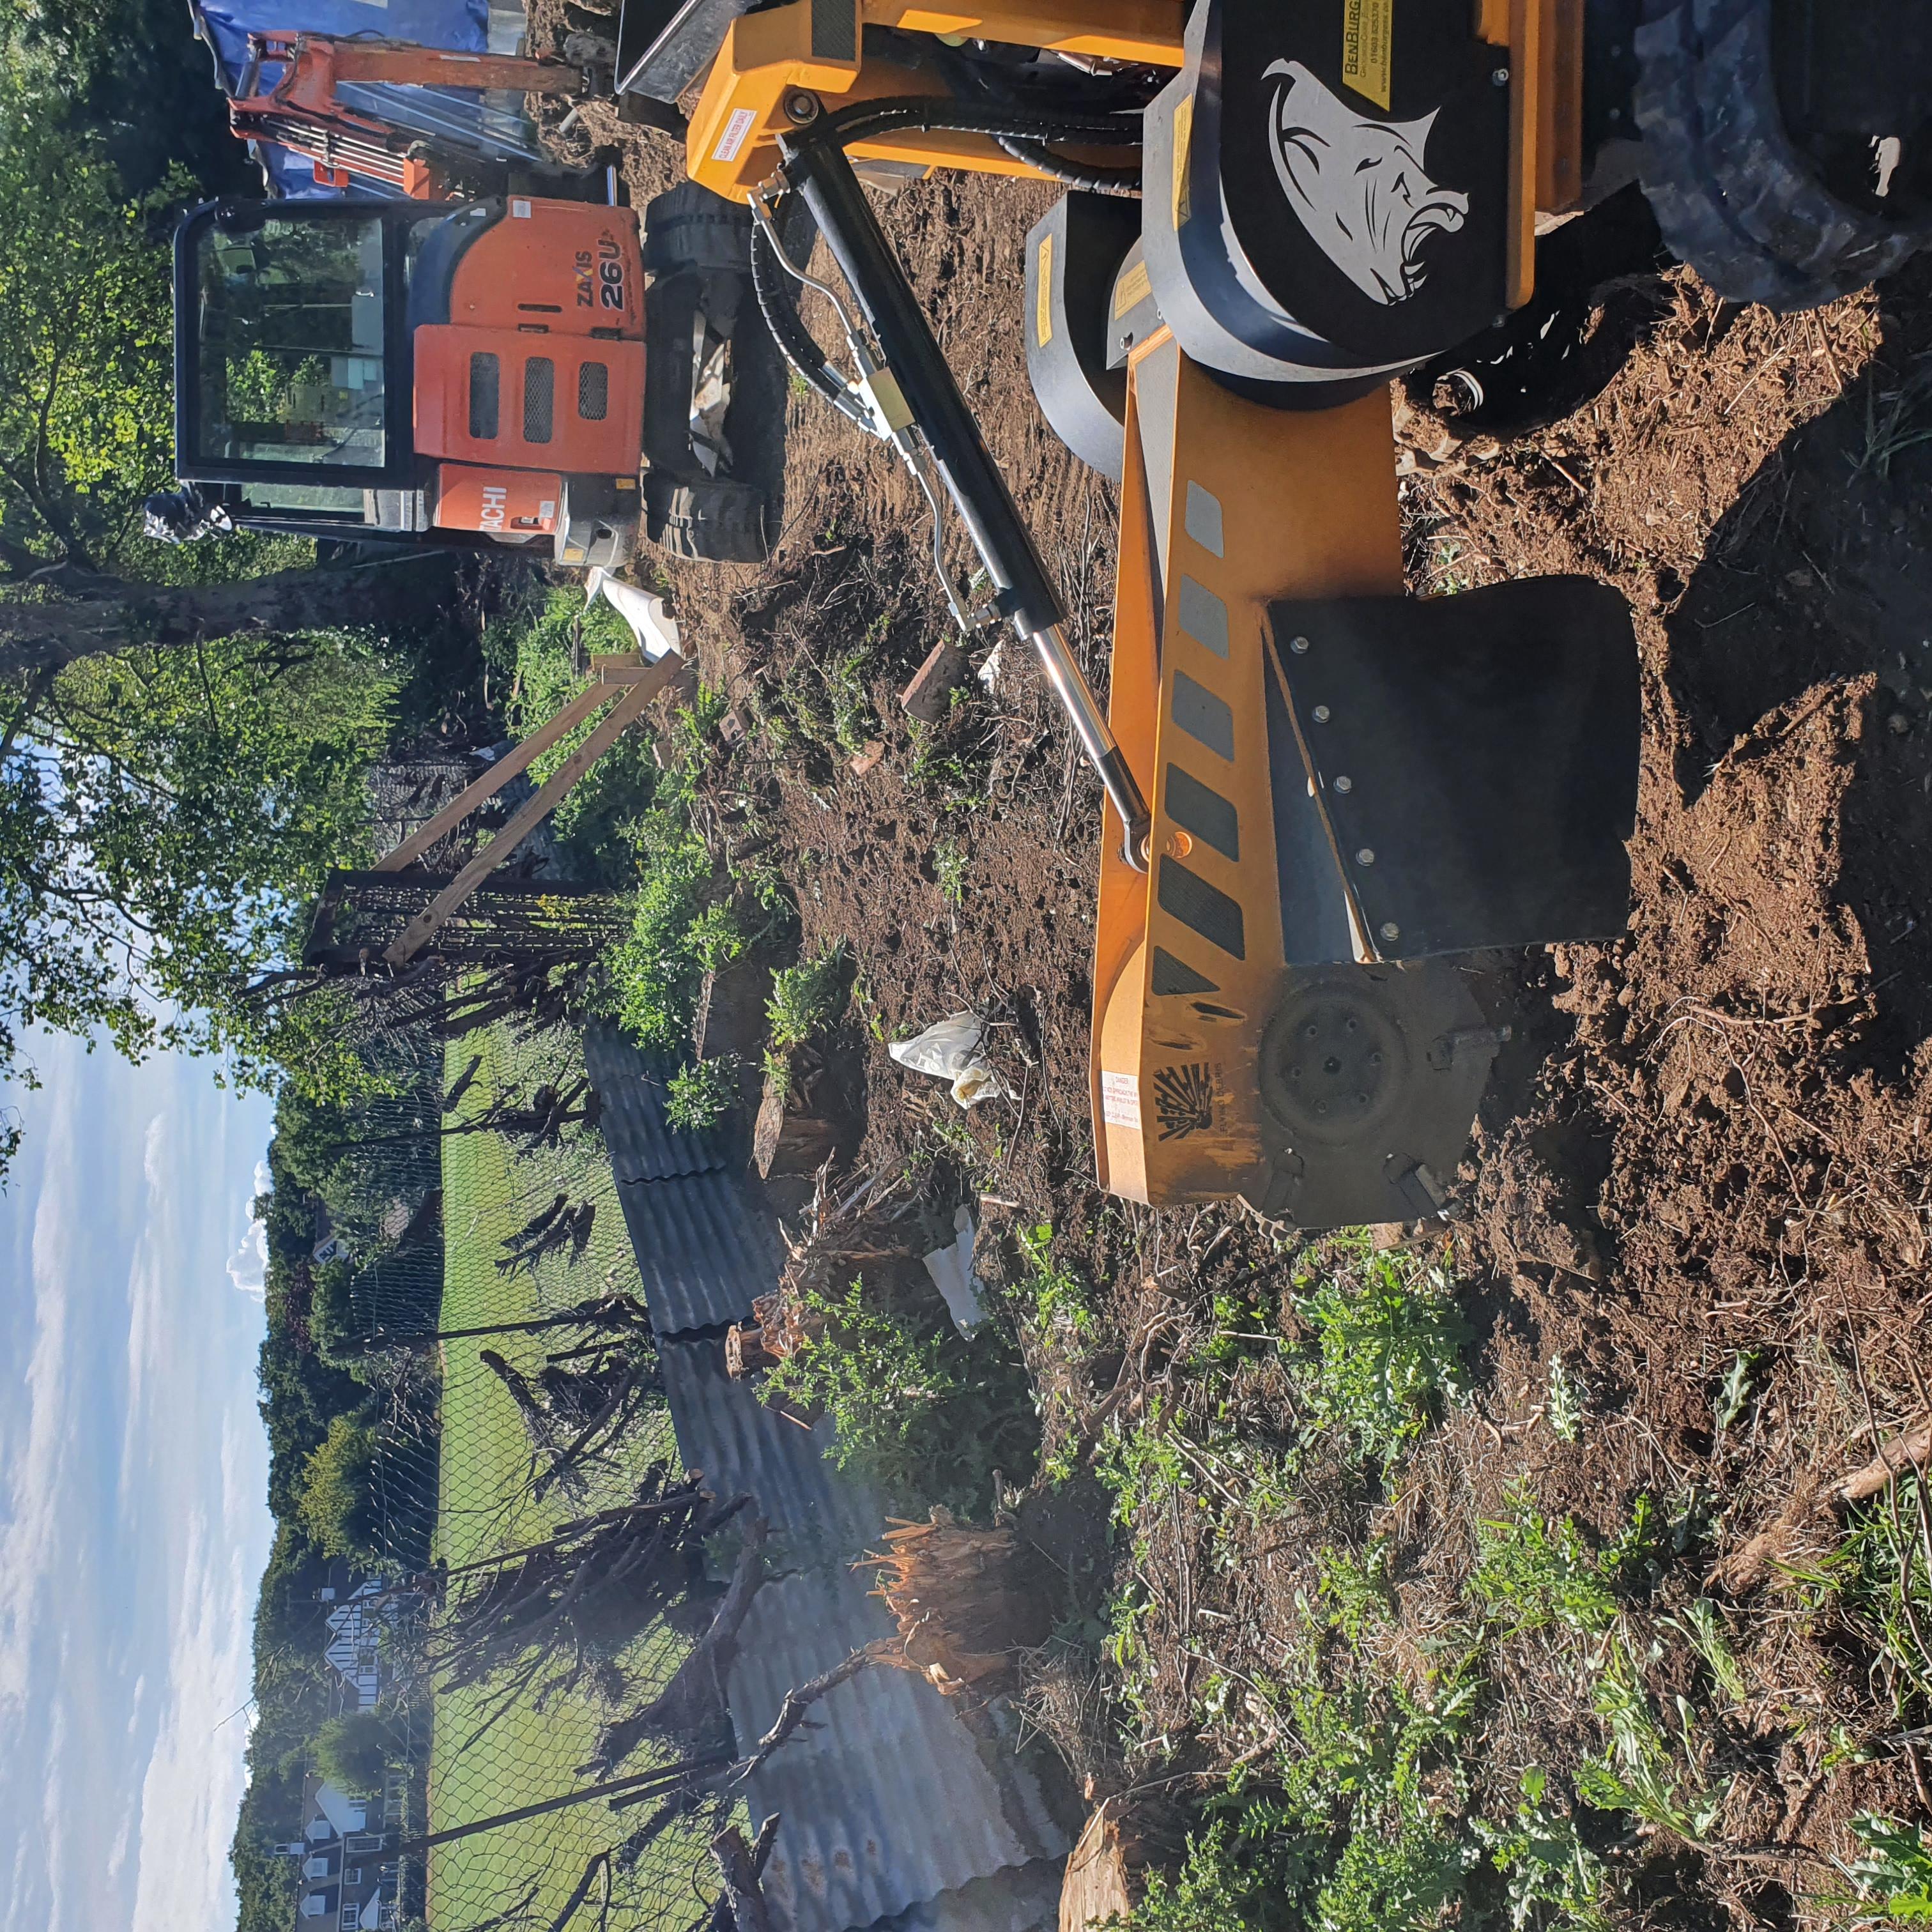 Tree Stump Removal - Excavator Or Stump Grinder?